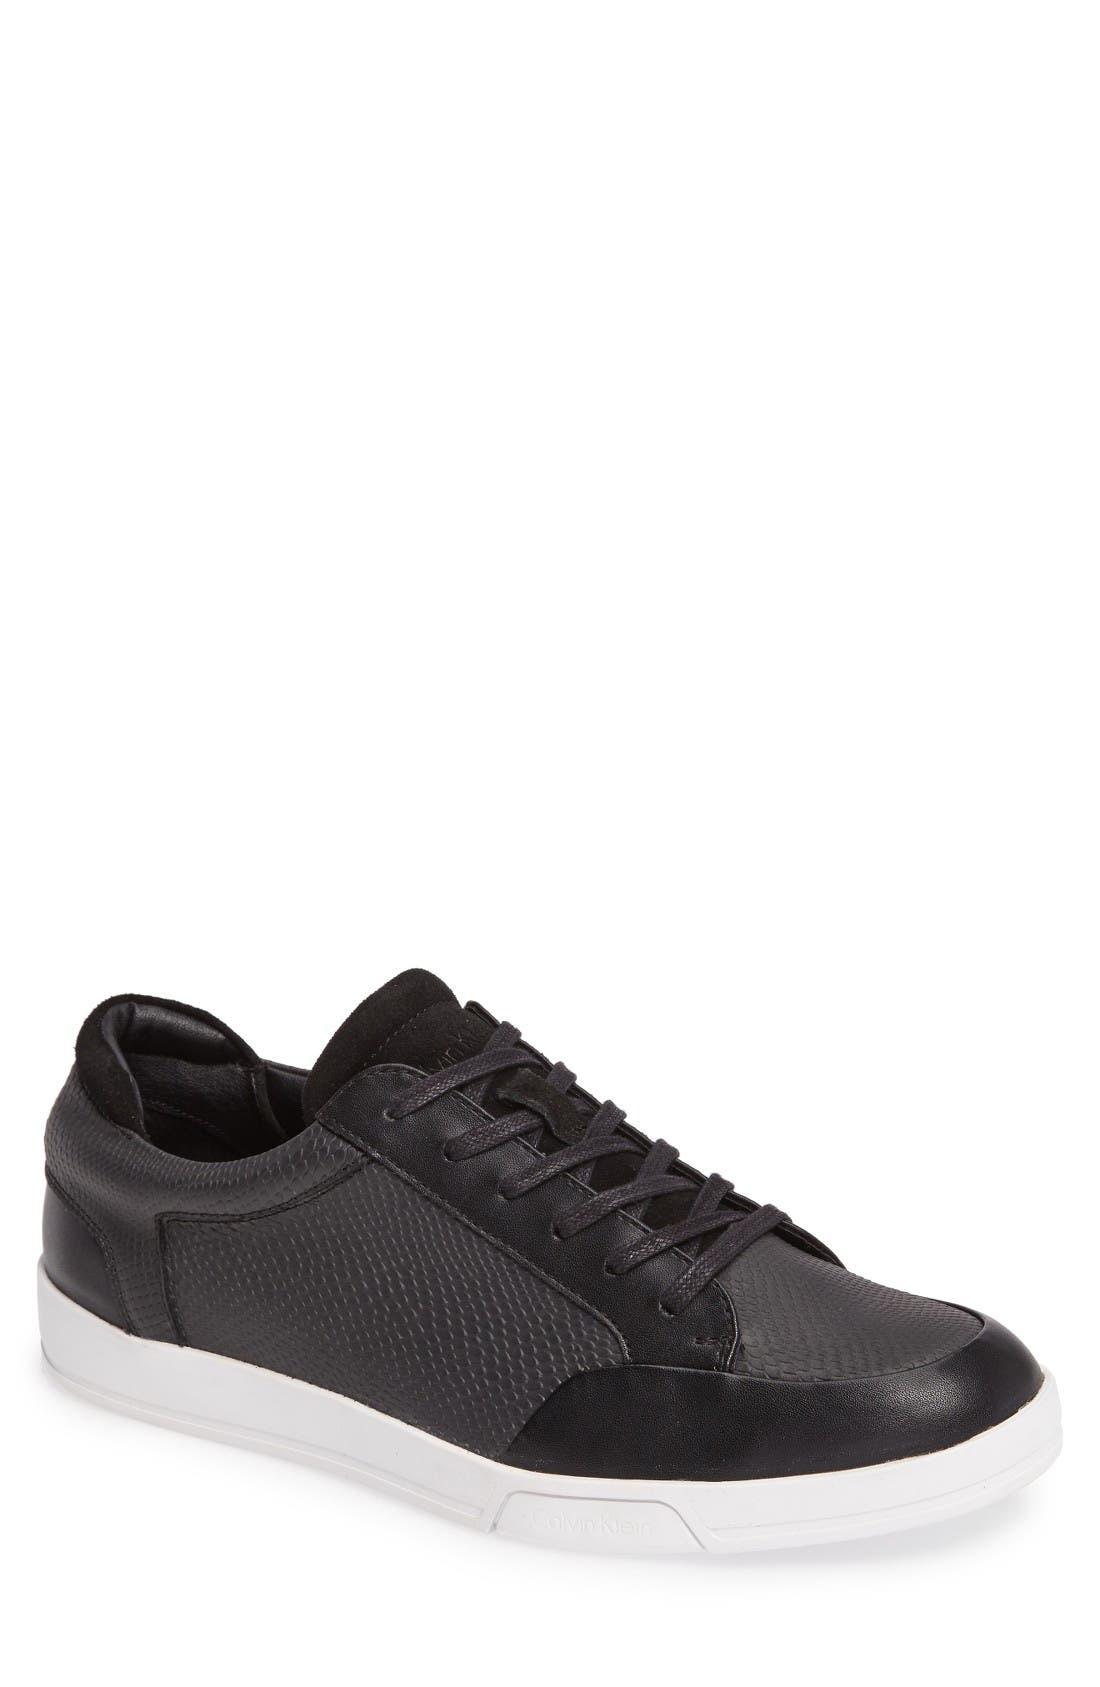 Alternate Image 1 Selected - Calvin Klein Balin Sneaker (Men)